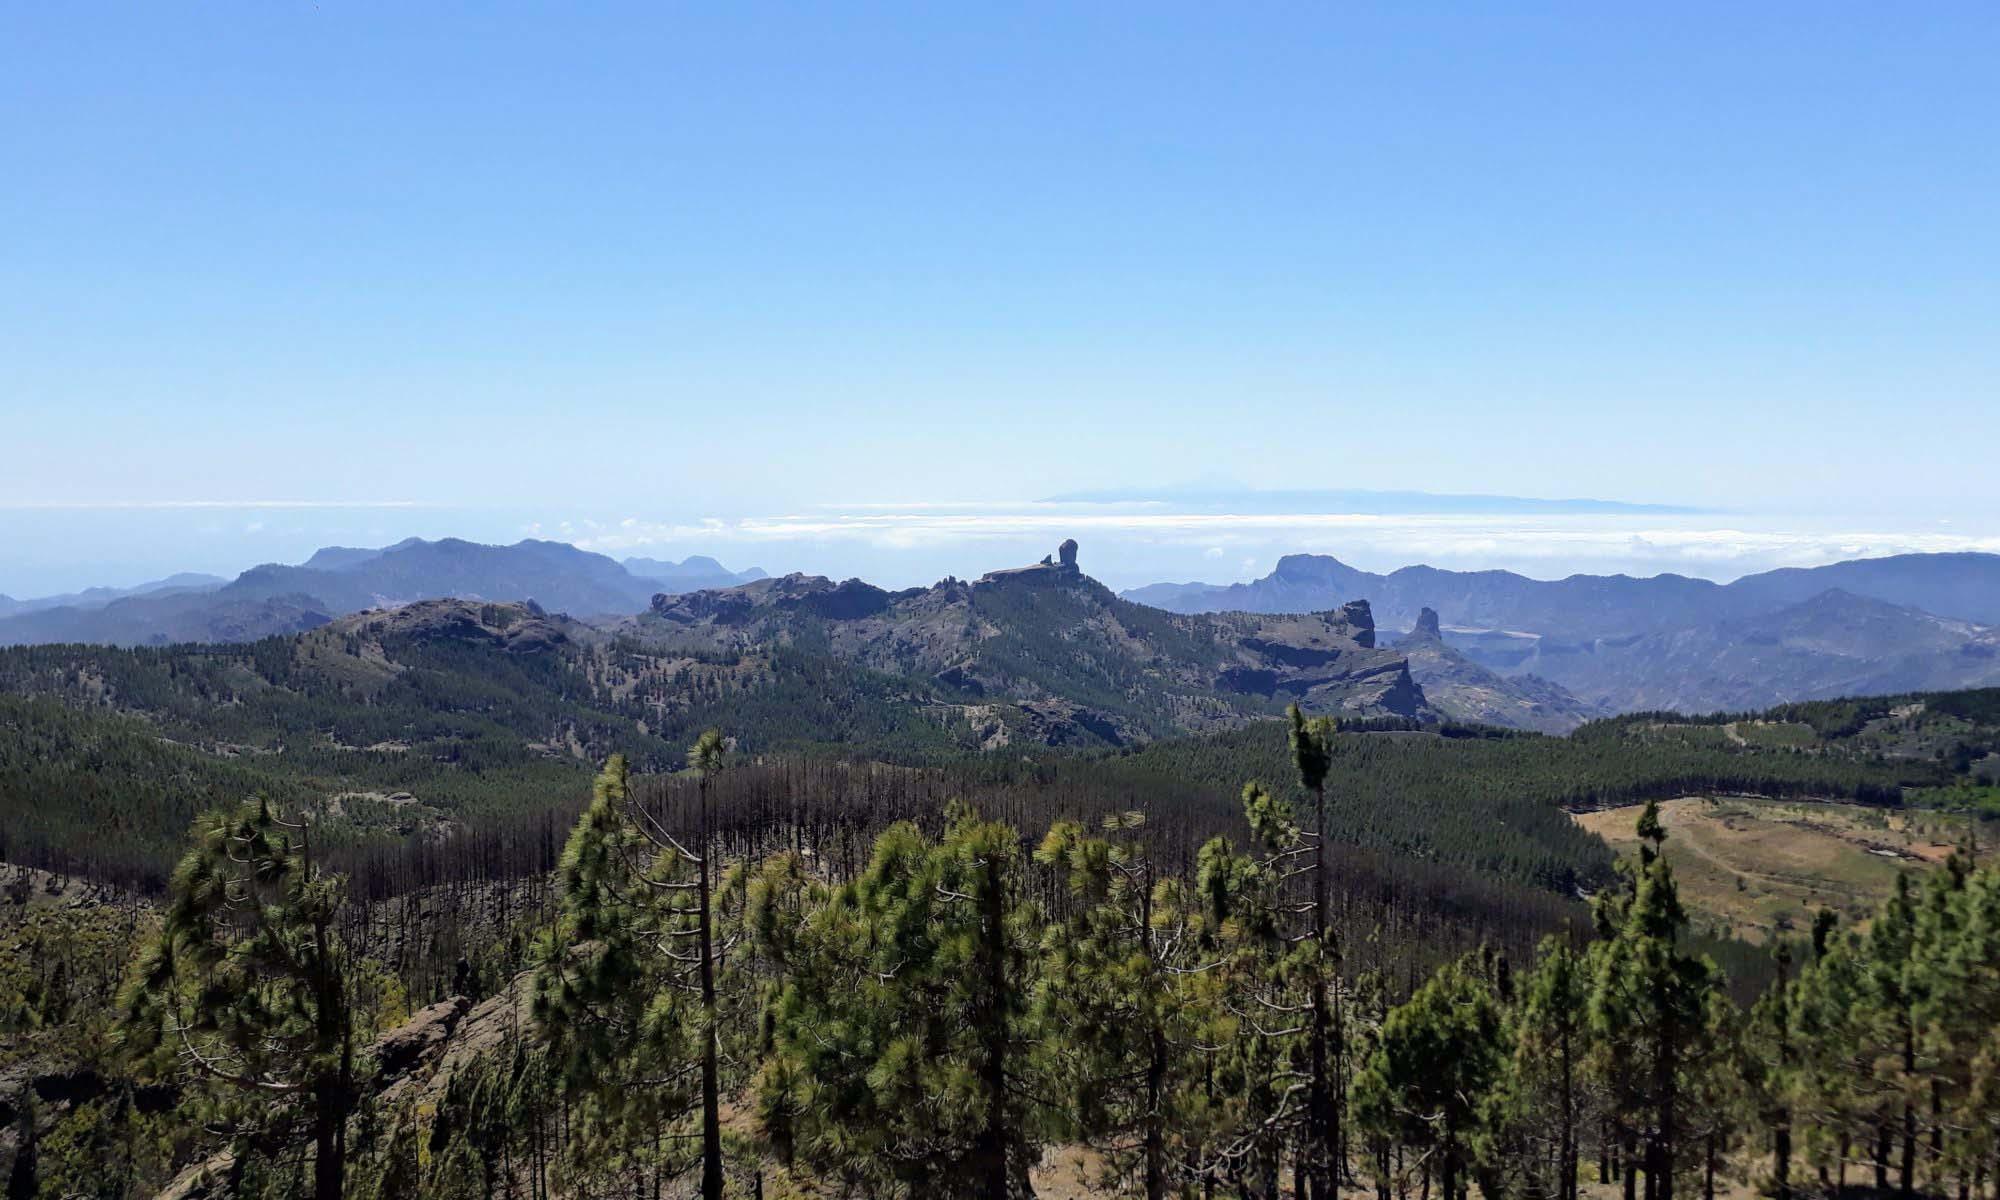 Gran Canaria: Miniature Continent